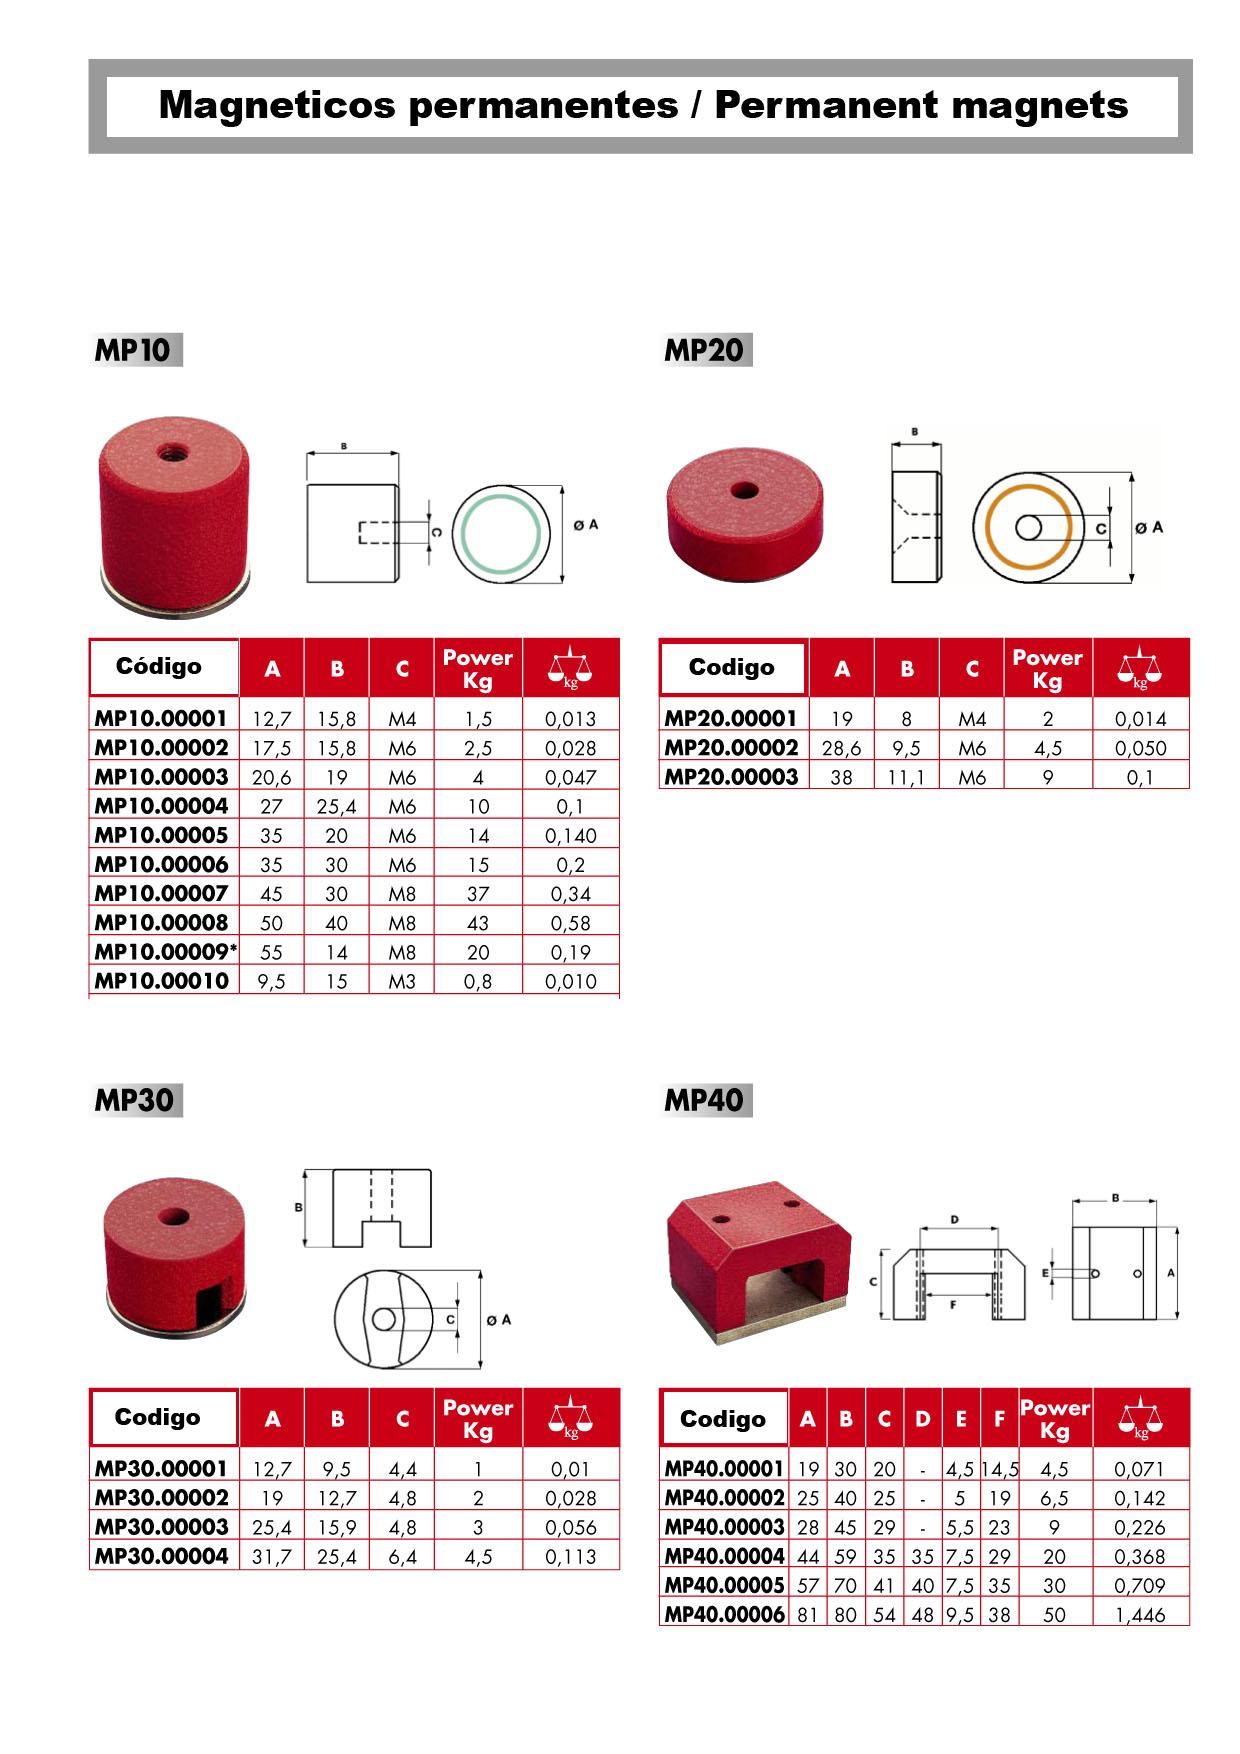 Magnéticos MP10 / MP20 / MP30 e MP40